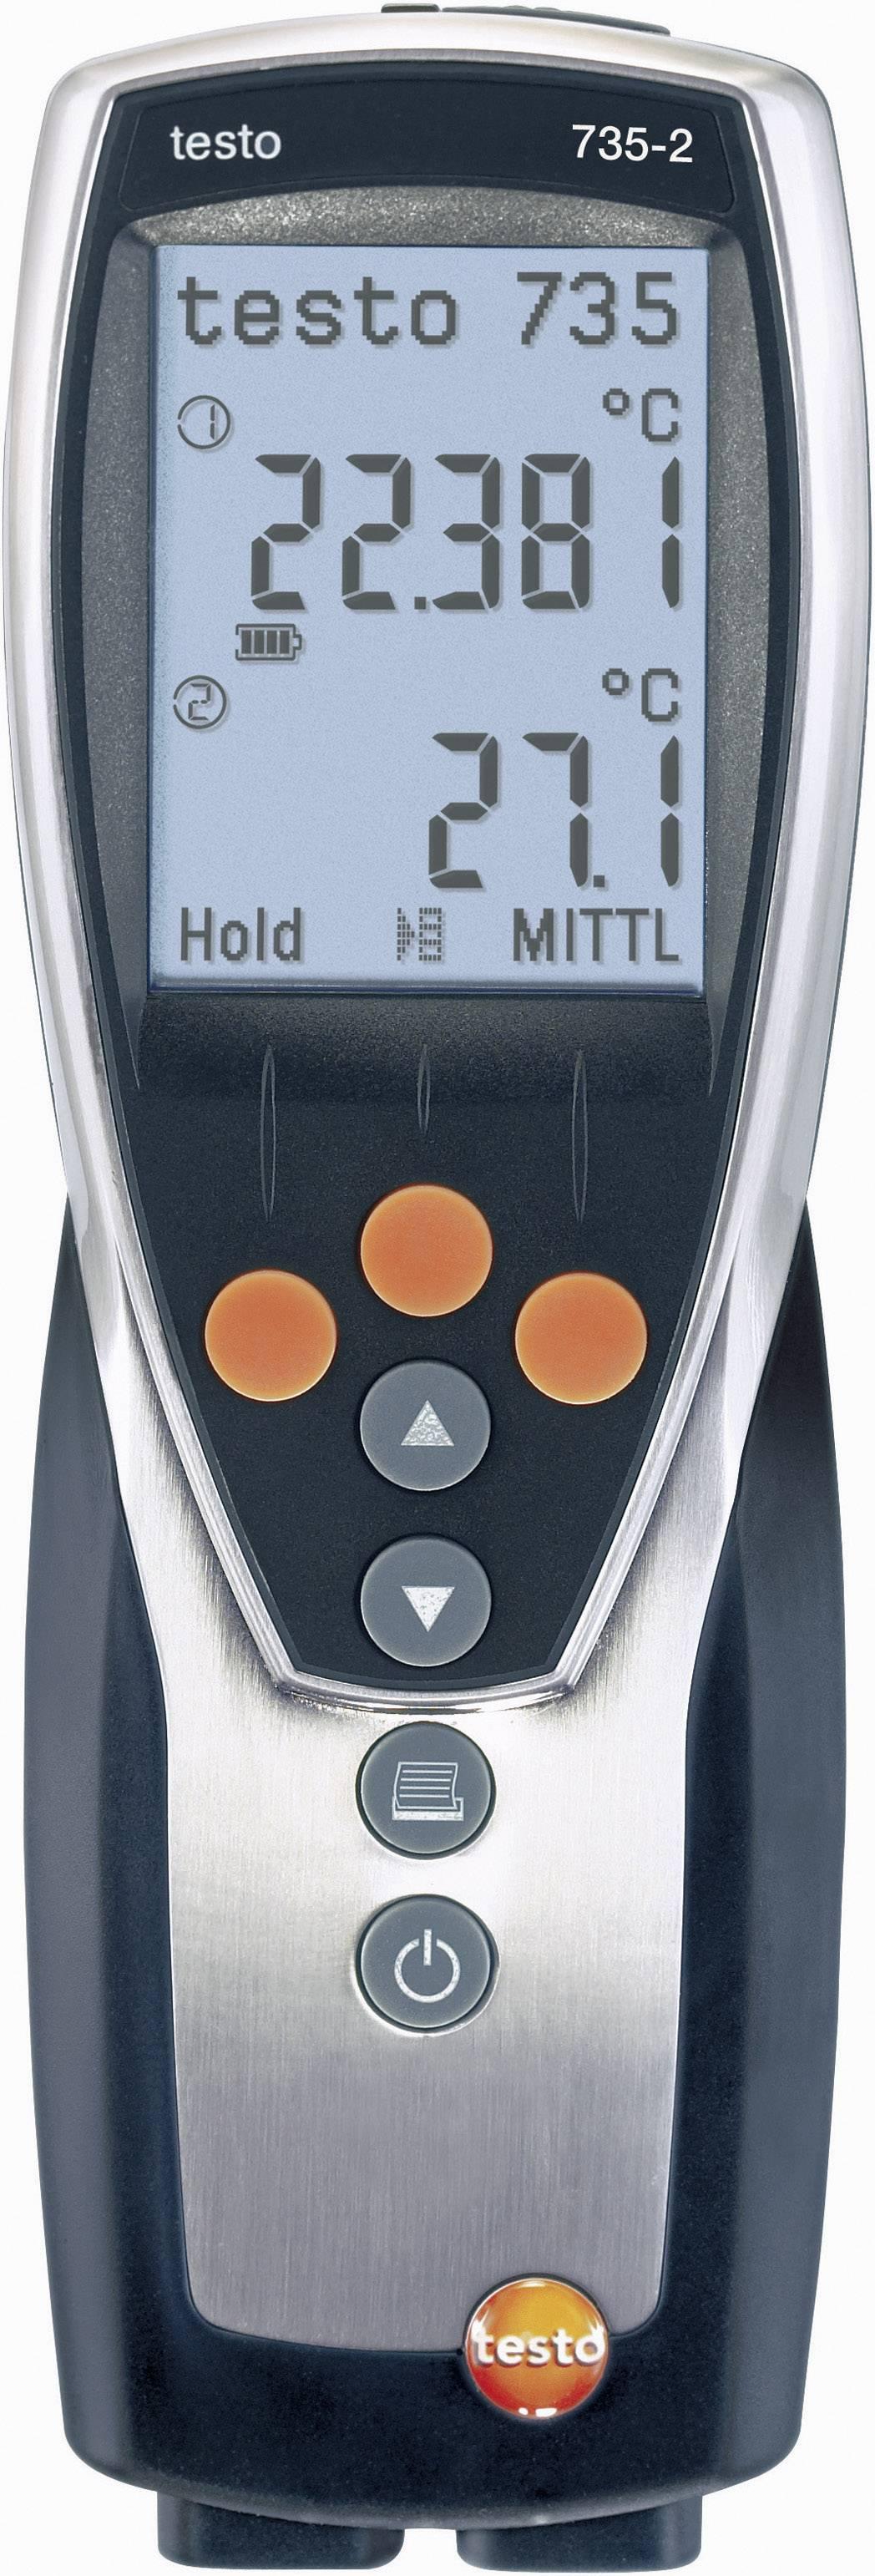 Teplomer testo 735-2, Pt100, -200 až +800 °C, typ K, -200 až +1370 °C